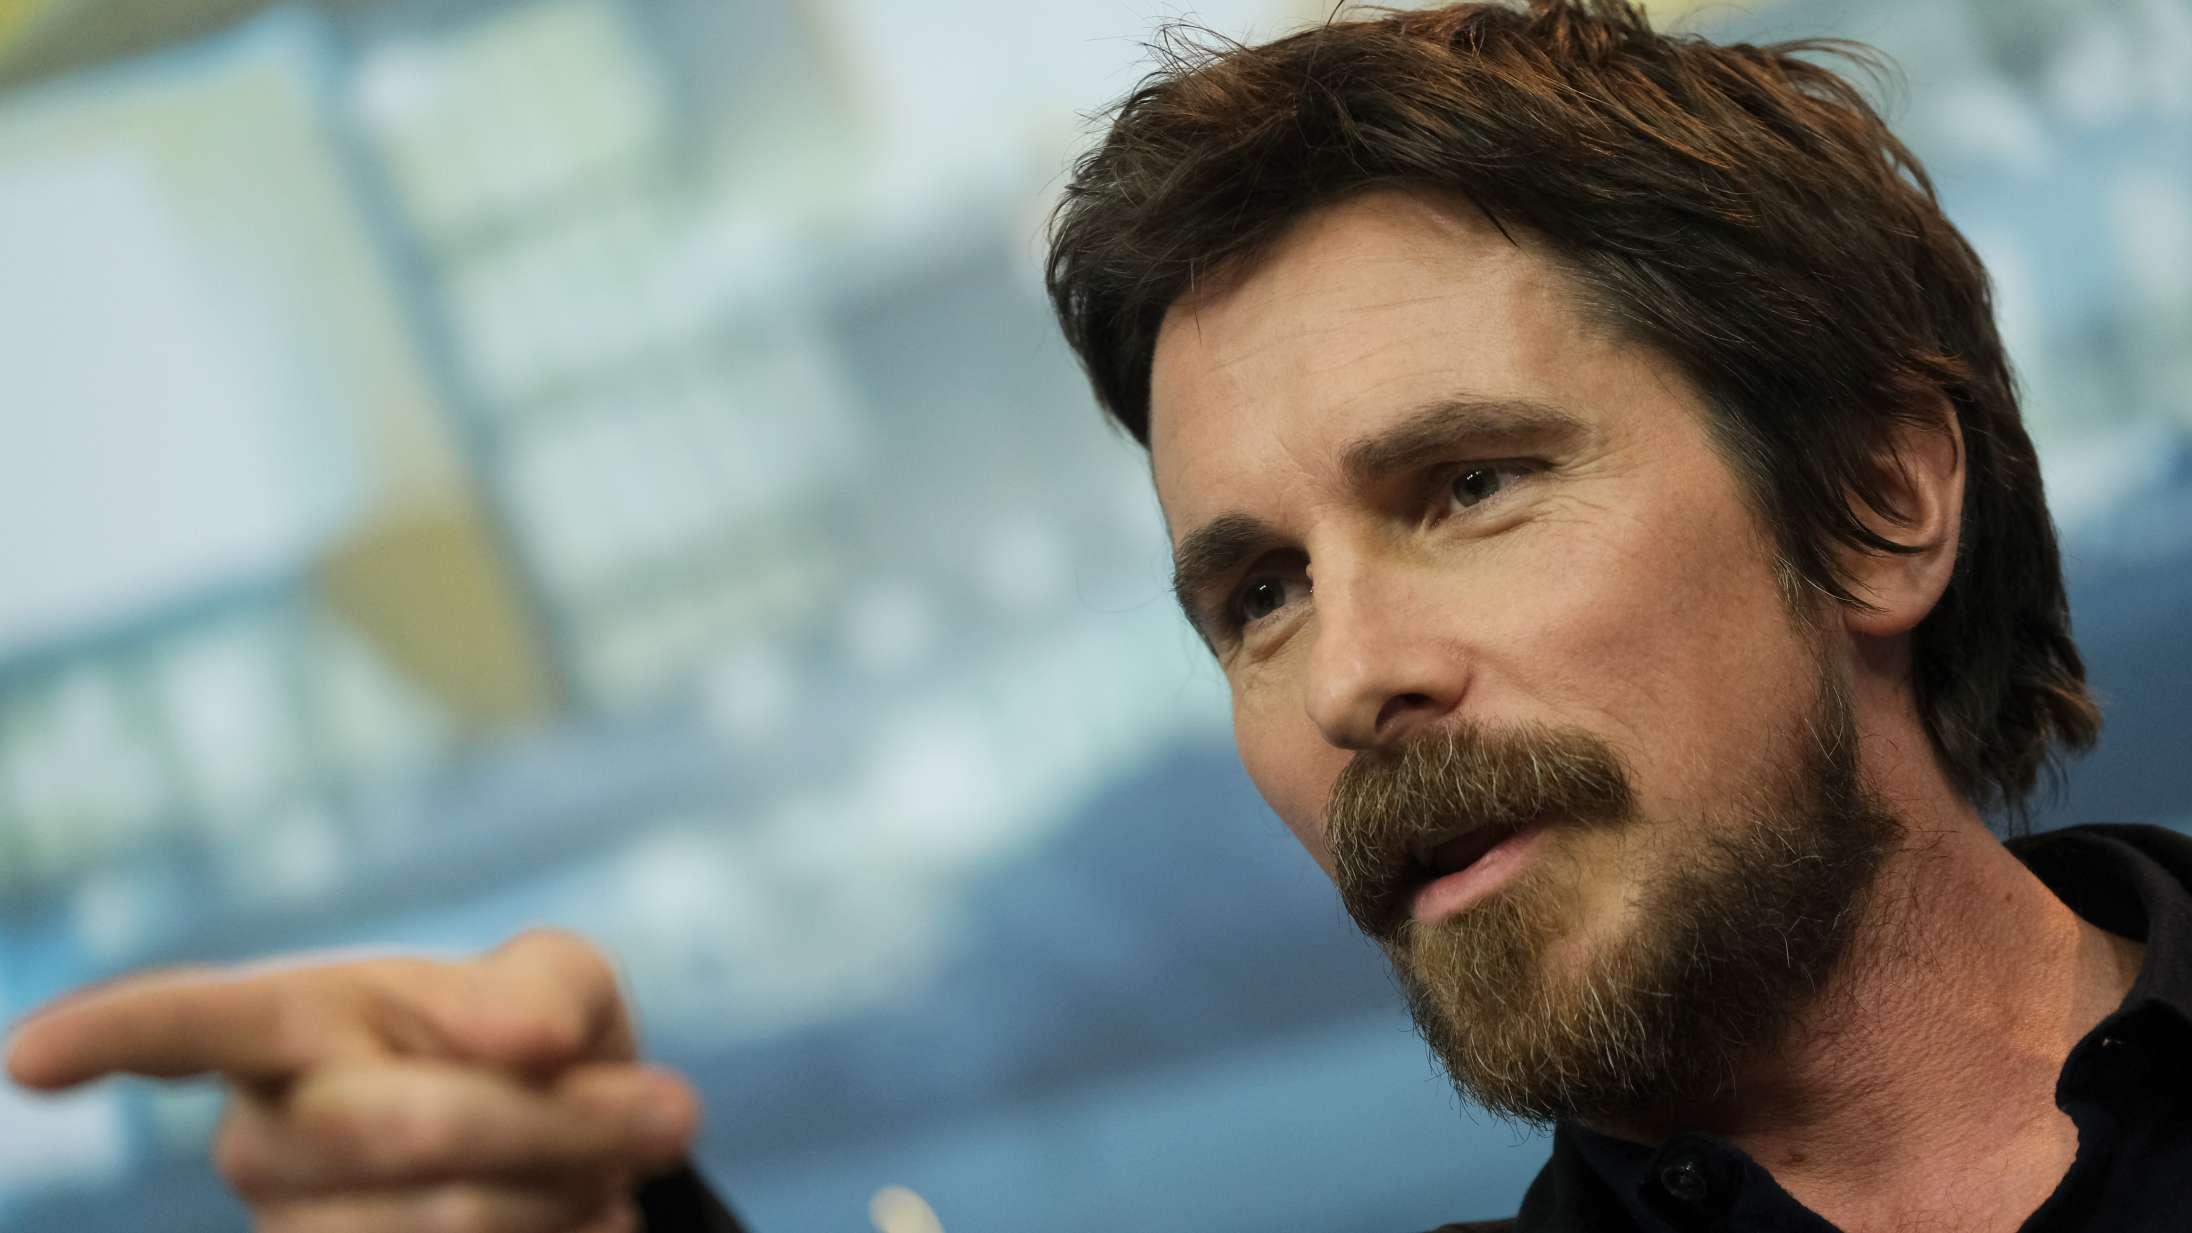 10 episke beefs på turbulente filmoptagelser – fra to gange Tom Hardy til Christian Bale og Megan Fox